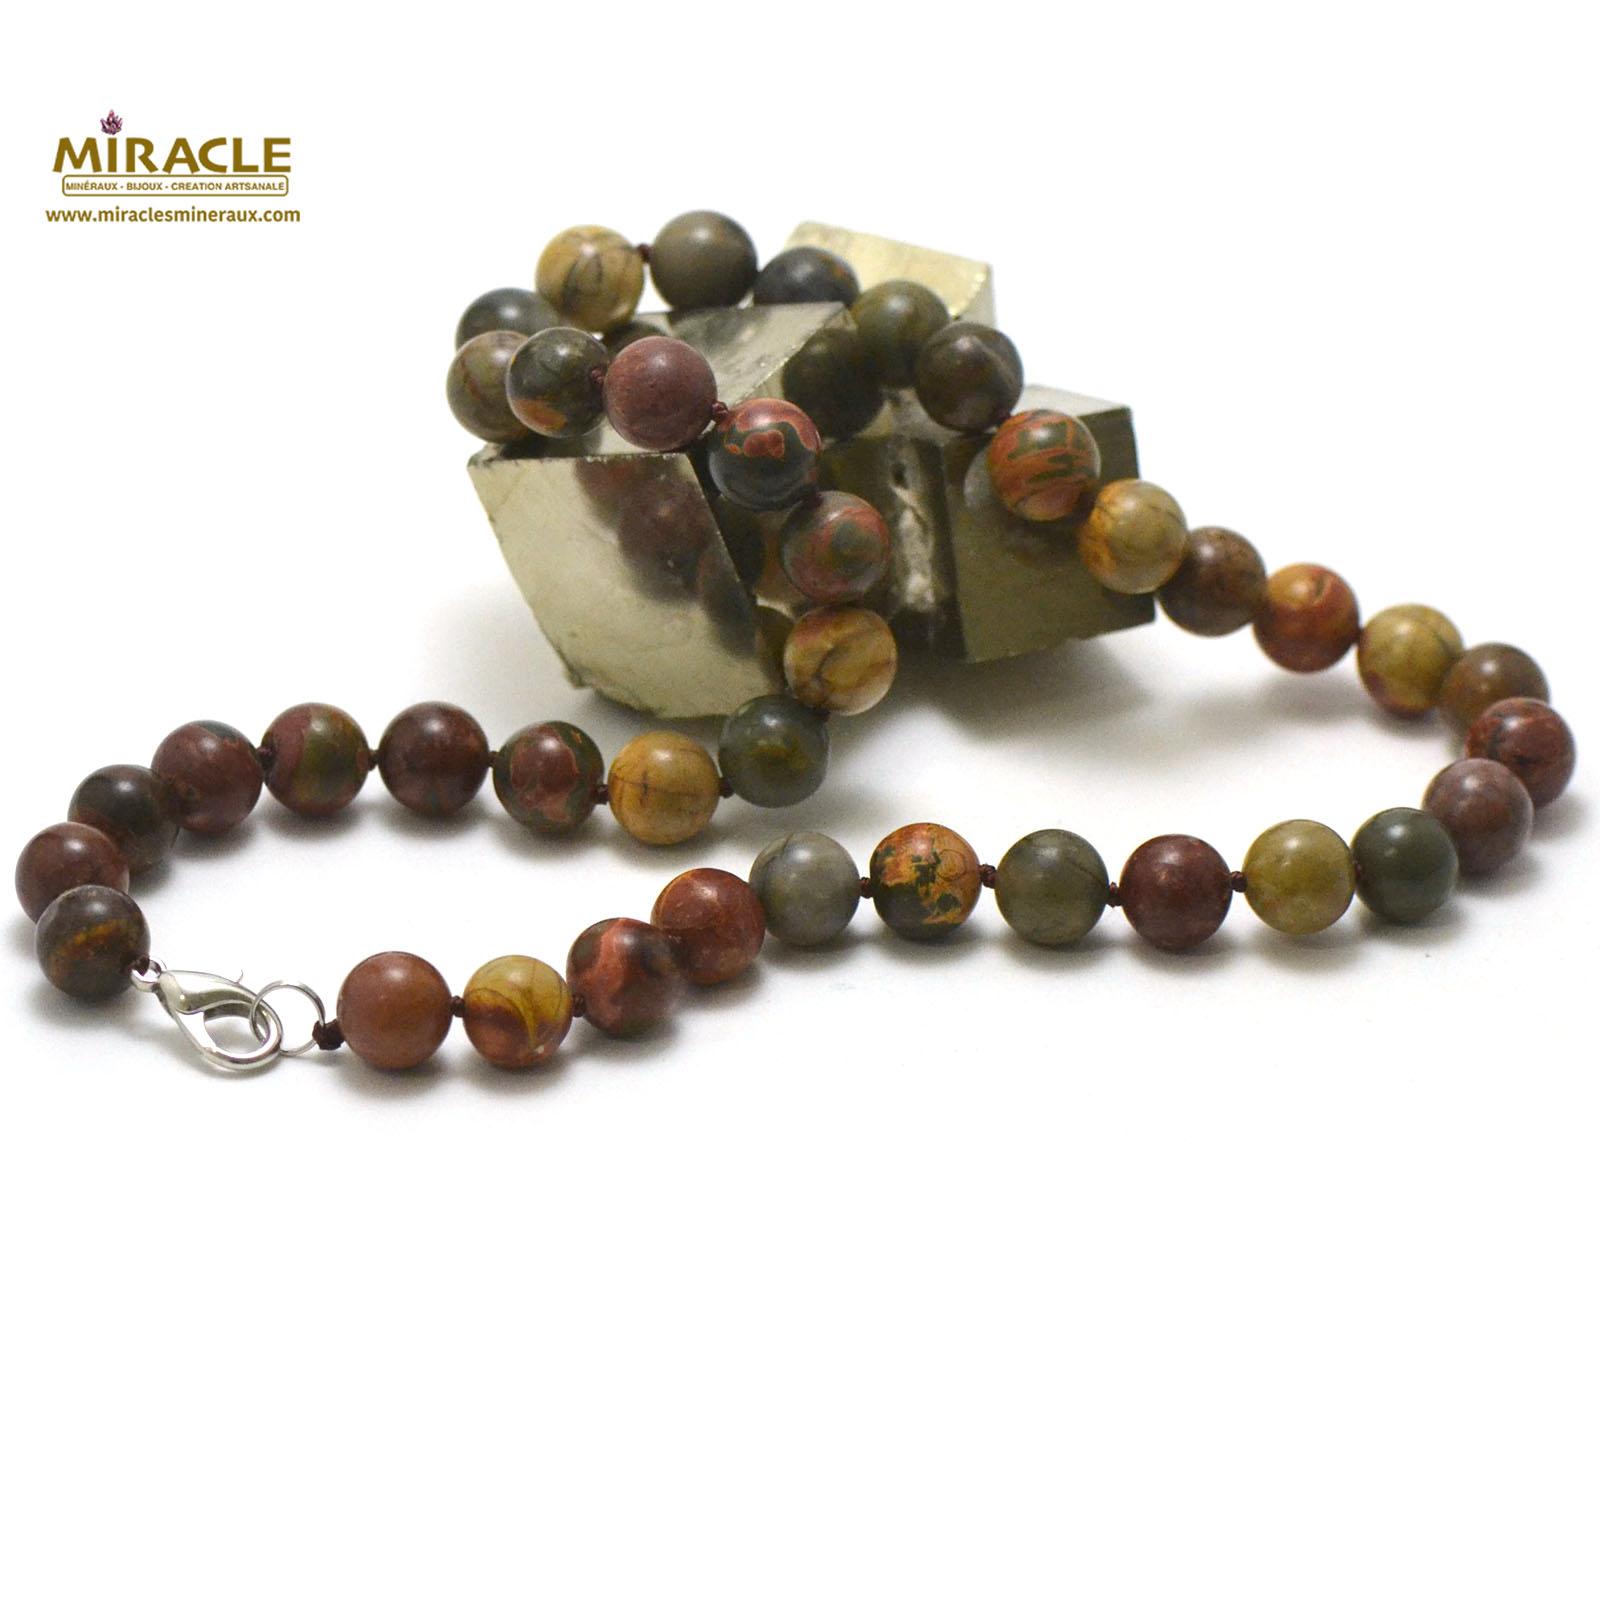 collier en jaspe picasso, perle ronde 10 mm